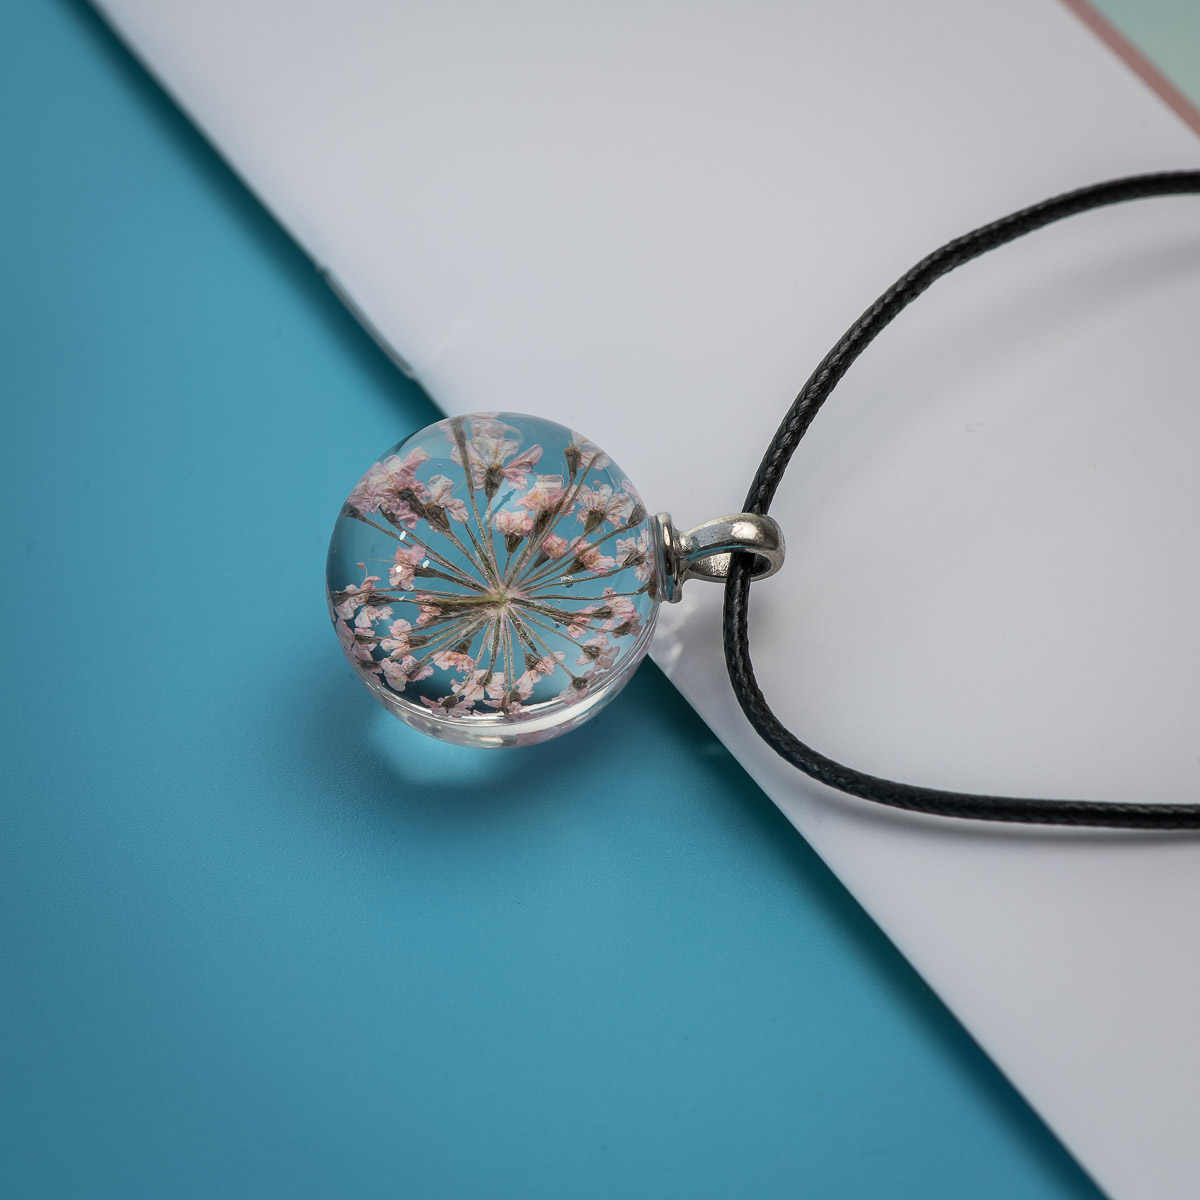 L 時間宝石広場ガラス花ネックレスペンダントチャーム工芸品ロングロープネックレス女性のための # FY316